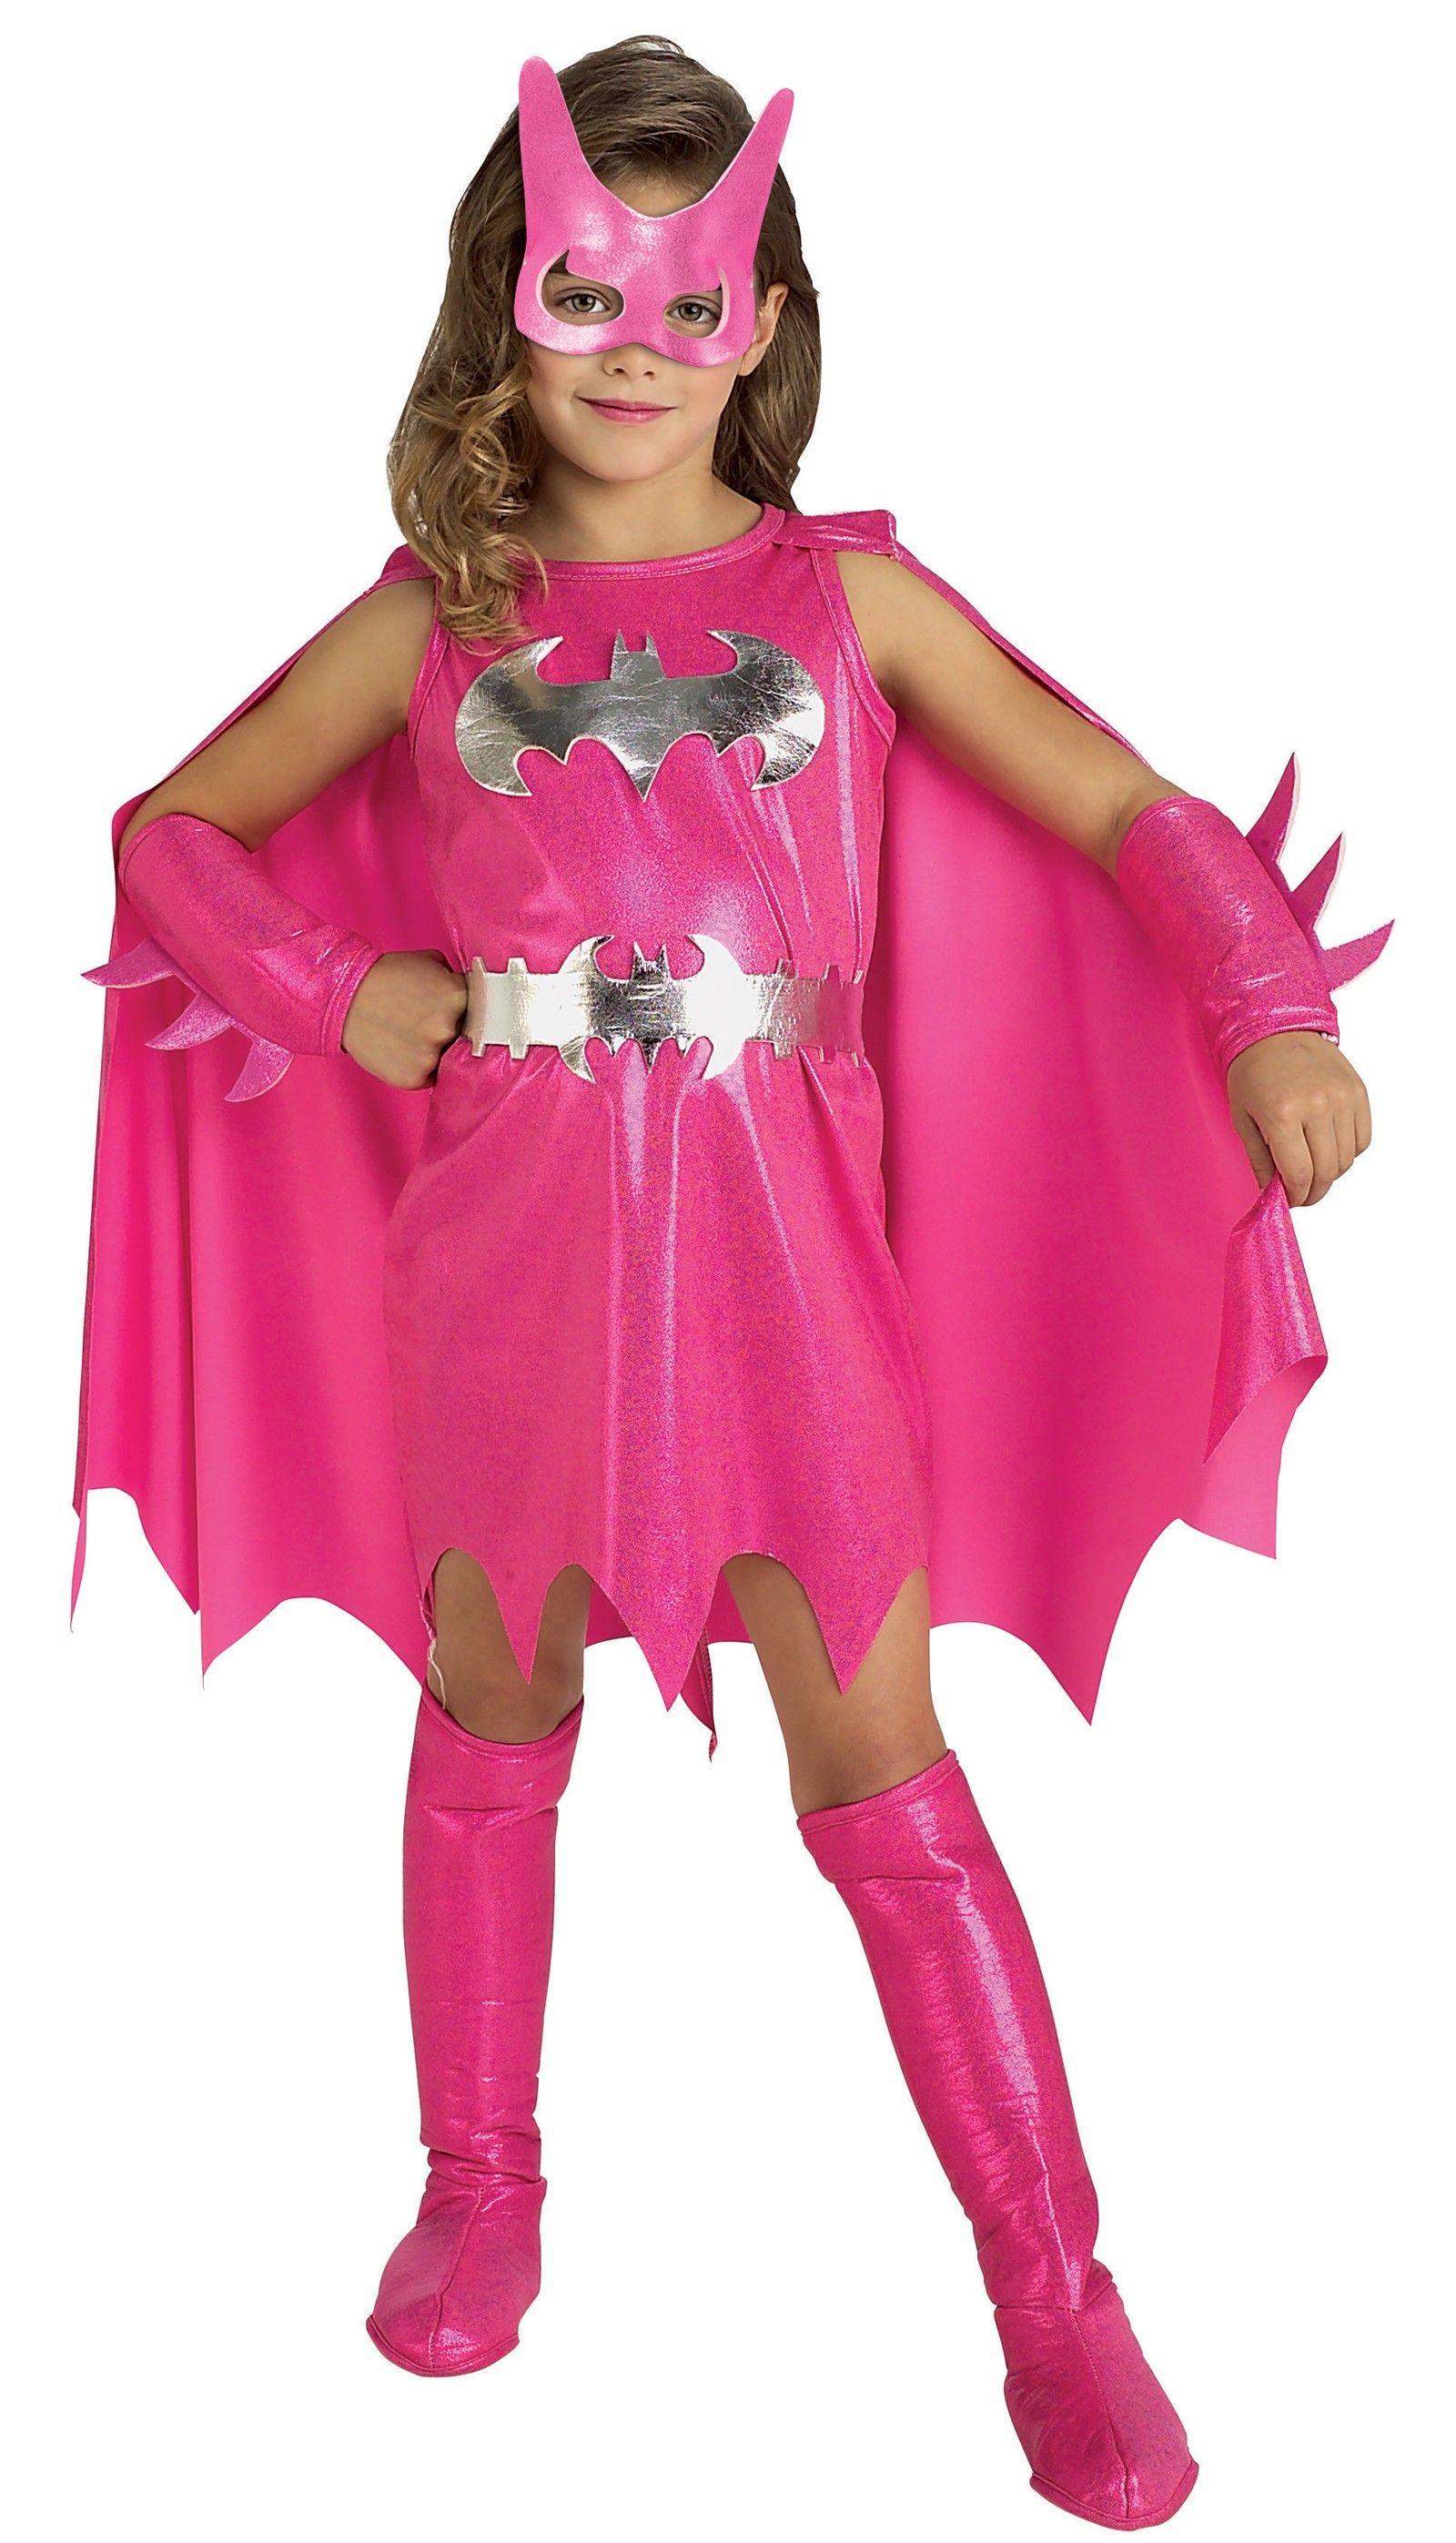 Disfraz de Batichica color Rosa para Niña | Proyectos que intentar ...